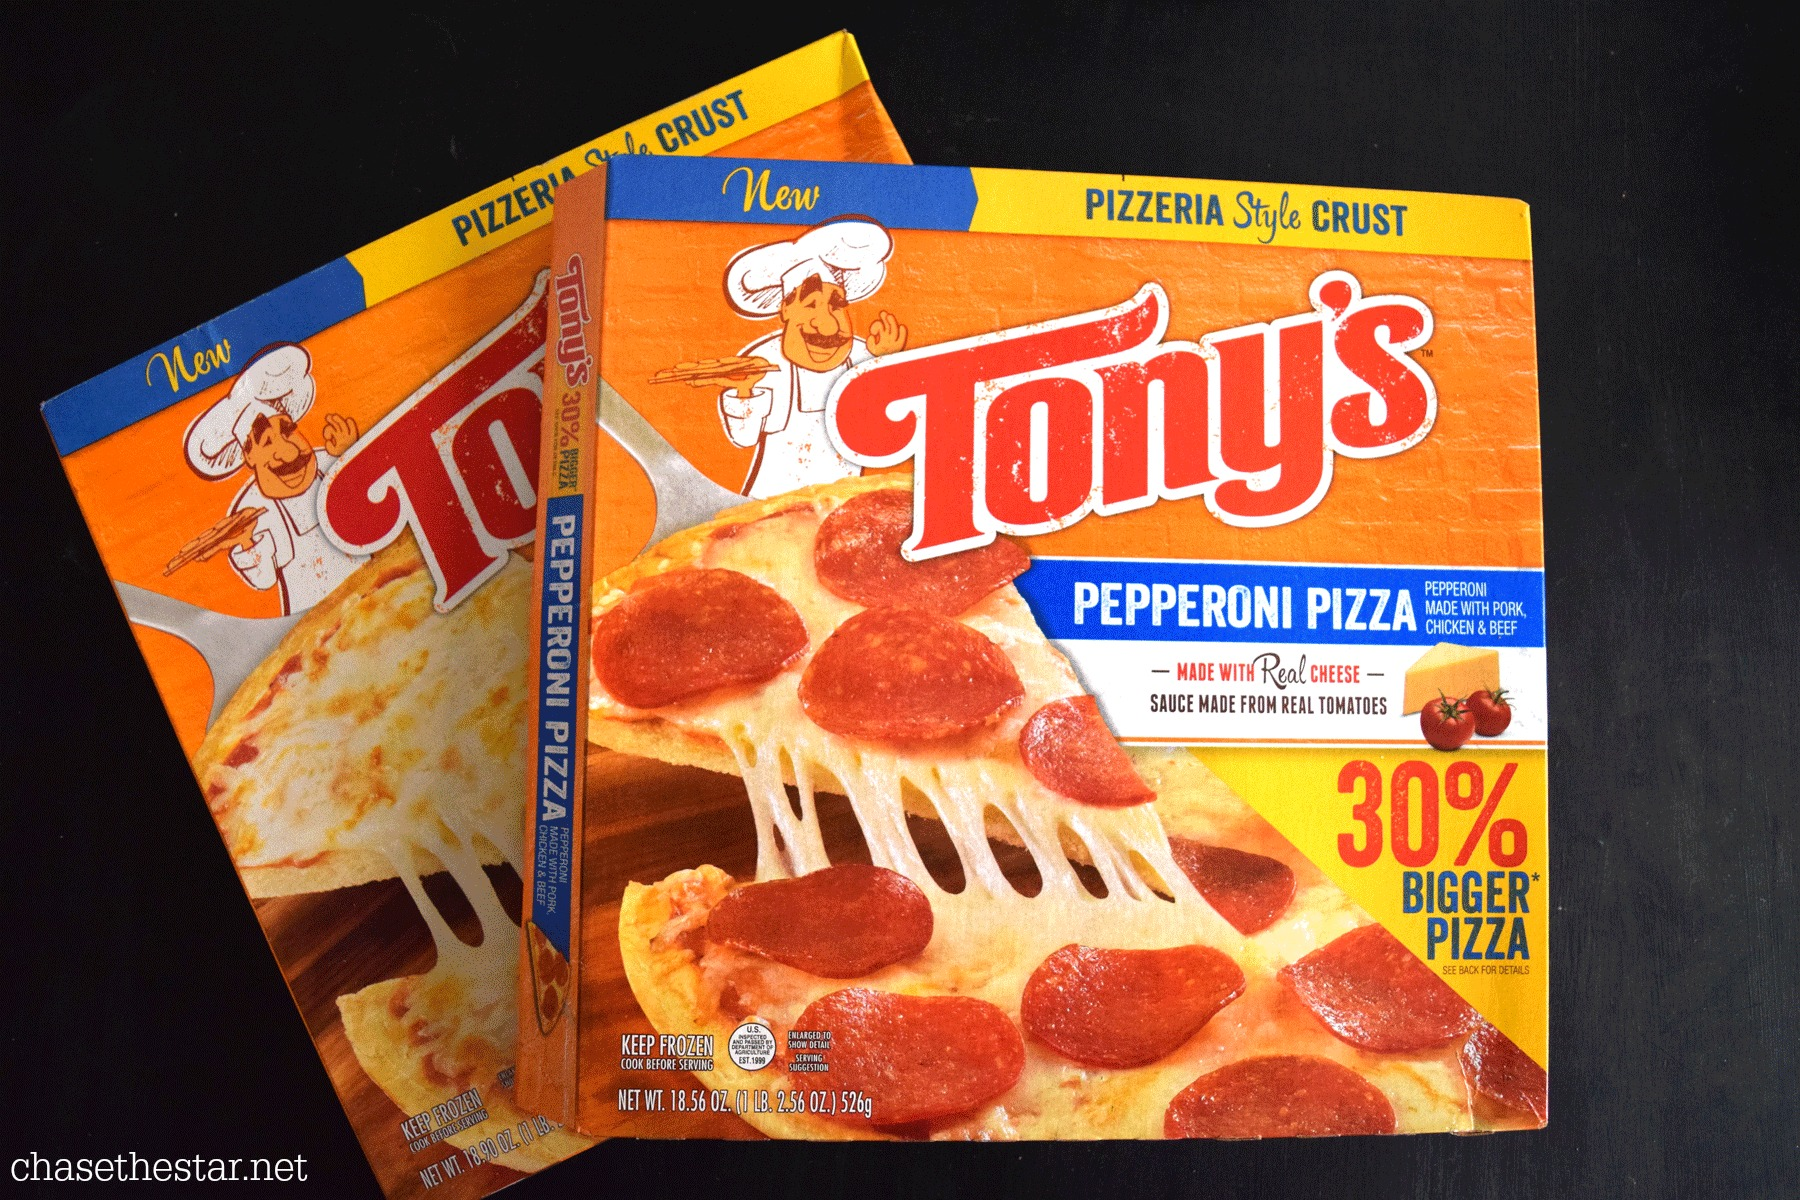 Tonys Pizza #BigPizzeriaTaste #Pmedia  #ad